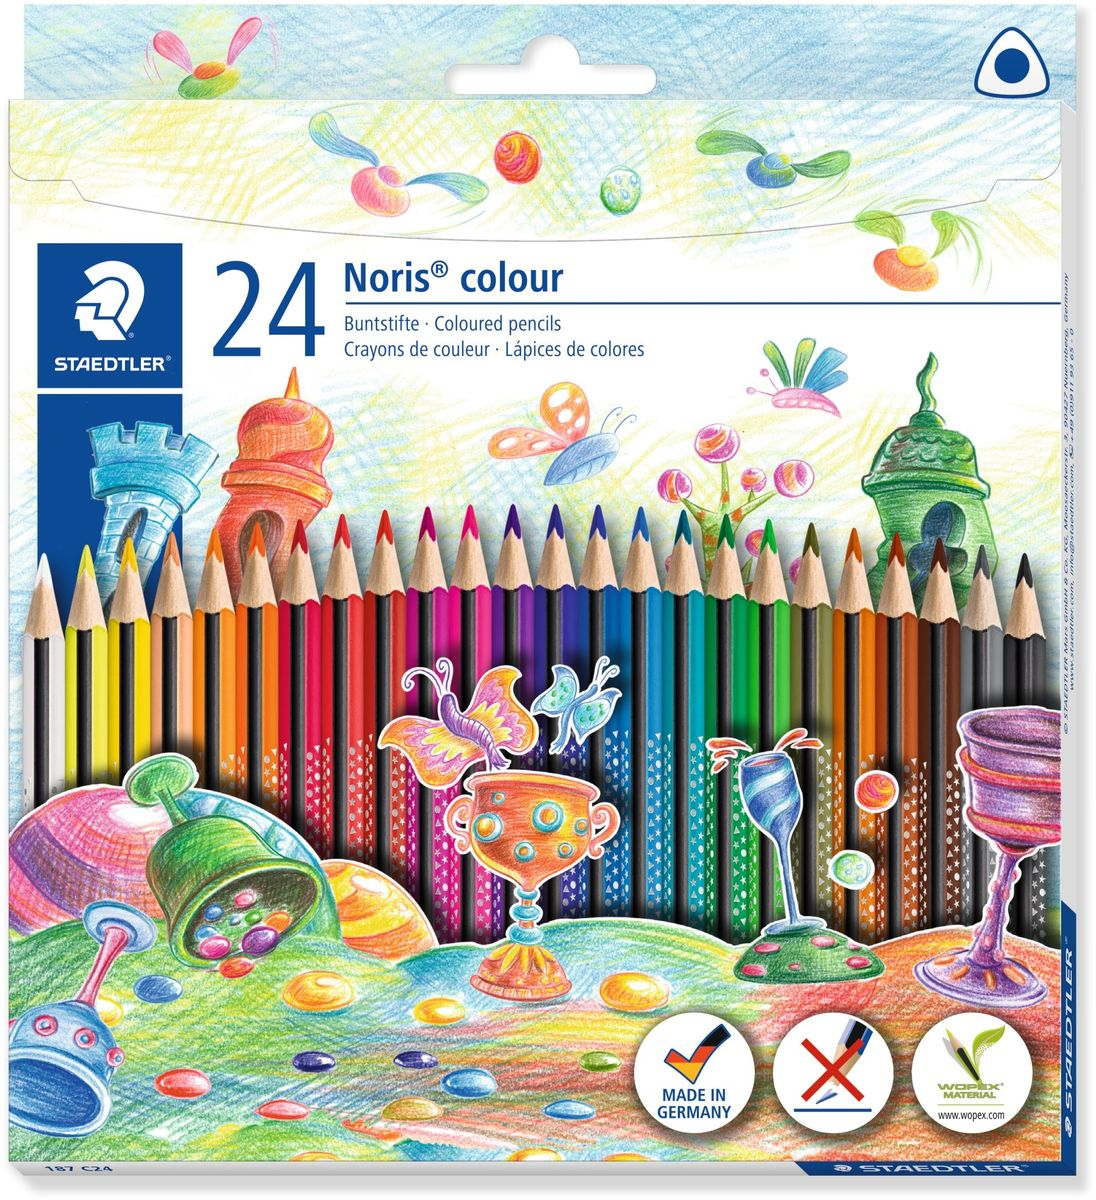 Staedtler Набор цветных карандашей Noris Colour Wopex 24 цвета -  Карандаши